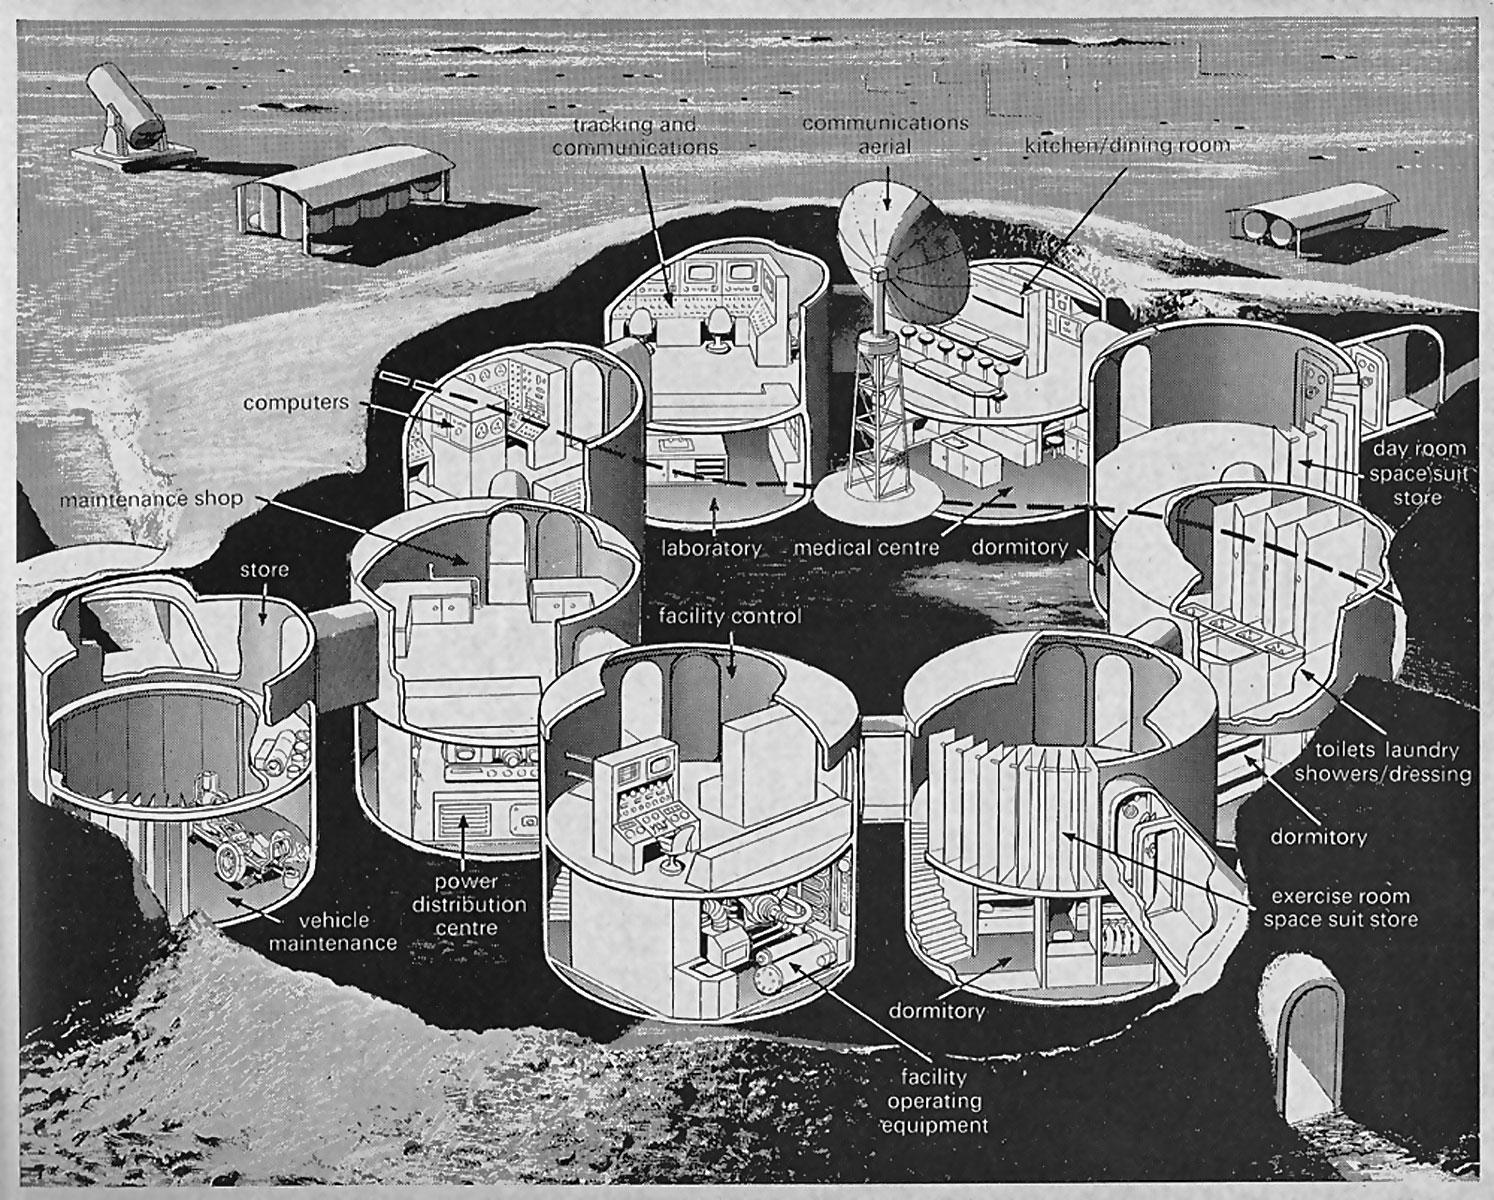 project horizon moon base documents - photo #22